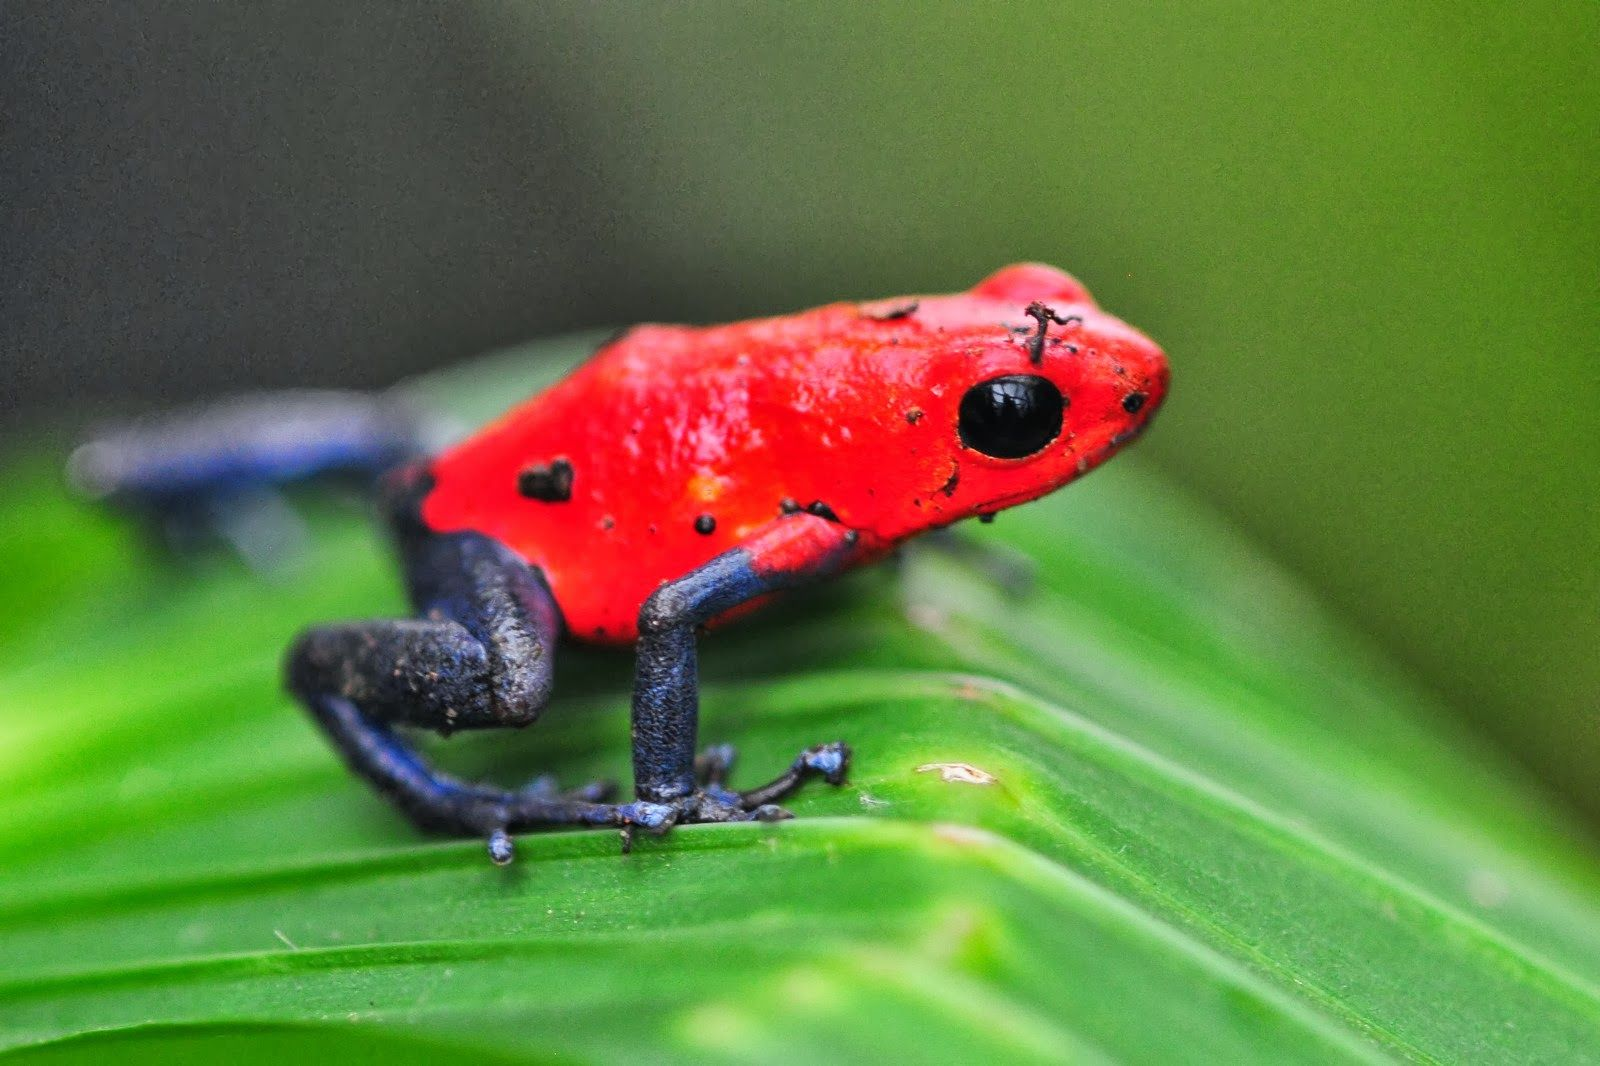 Poison Dart Frog Strawberry Poison Dart Frog Strawberry Poison